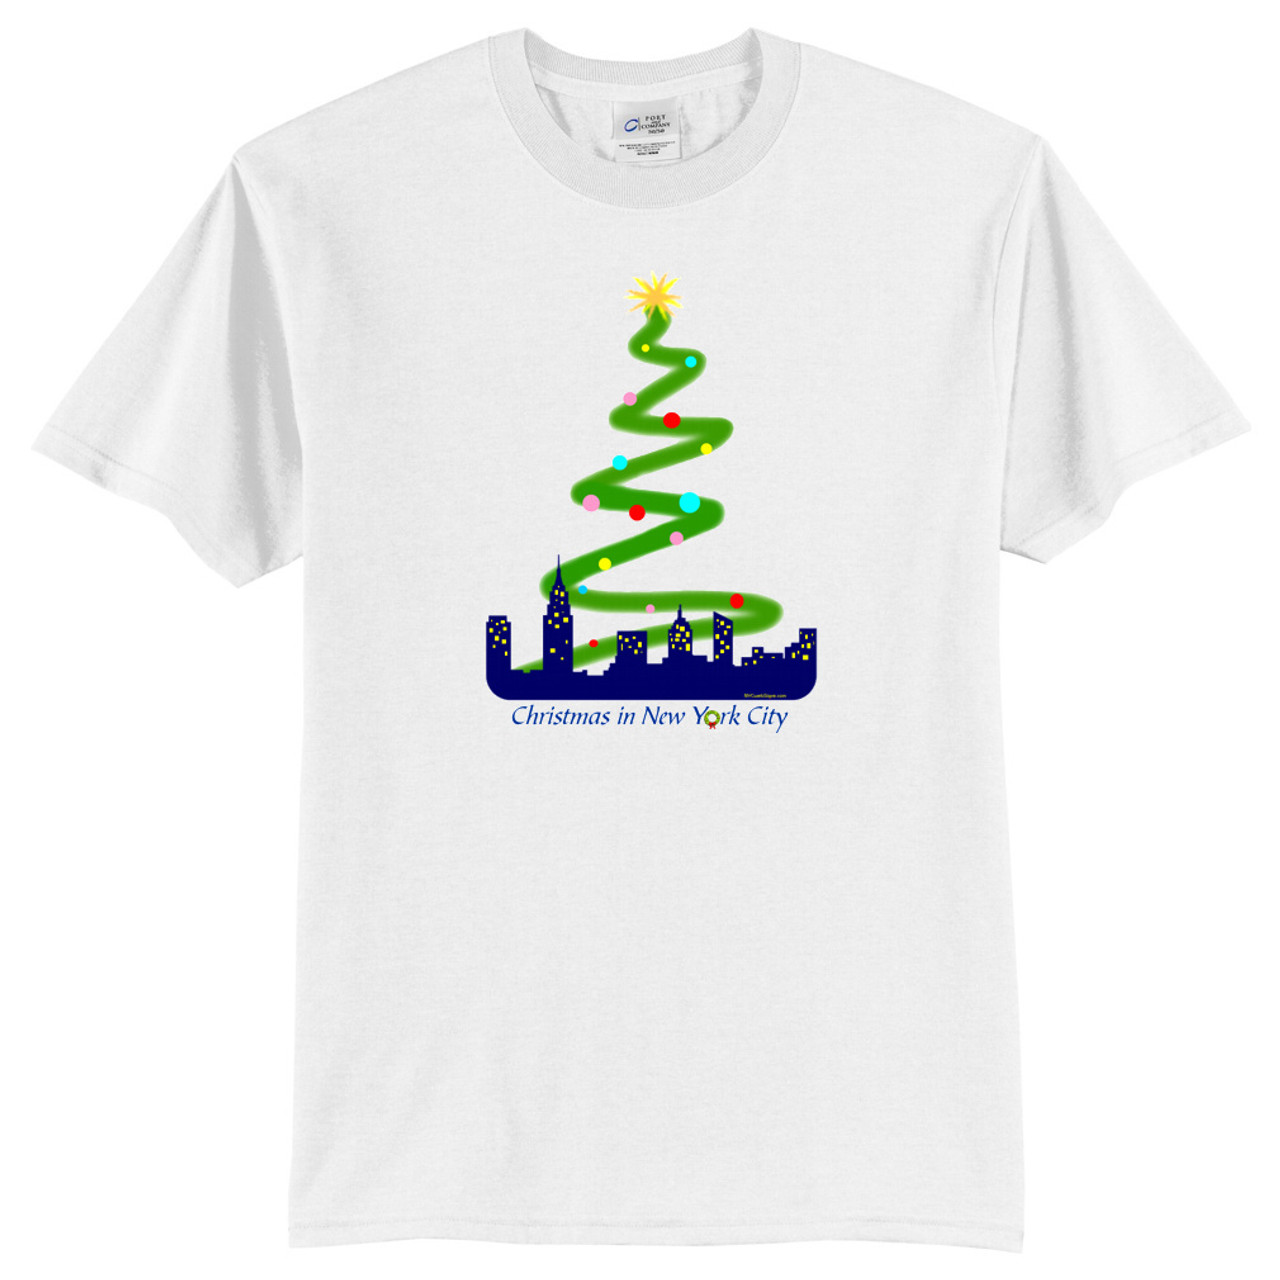 e27aa96f Christmas in New York City T-Shirts and Sweatshirts